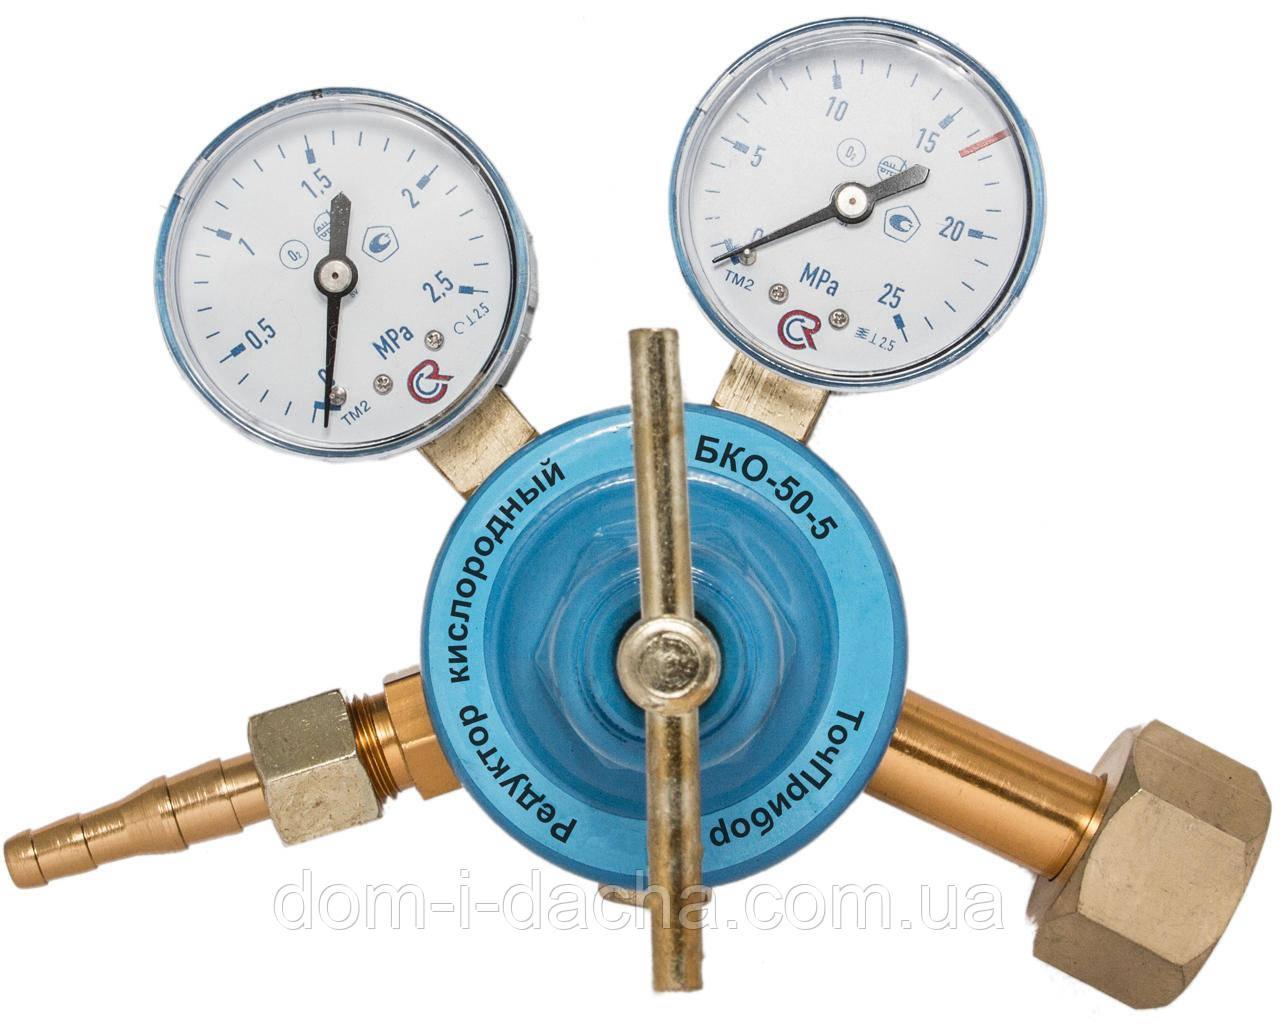 Редуктор с манометром кислородный БКО-50-5 (25 МПа) Точ.Прибор алюминий